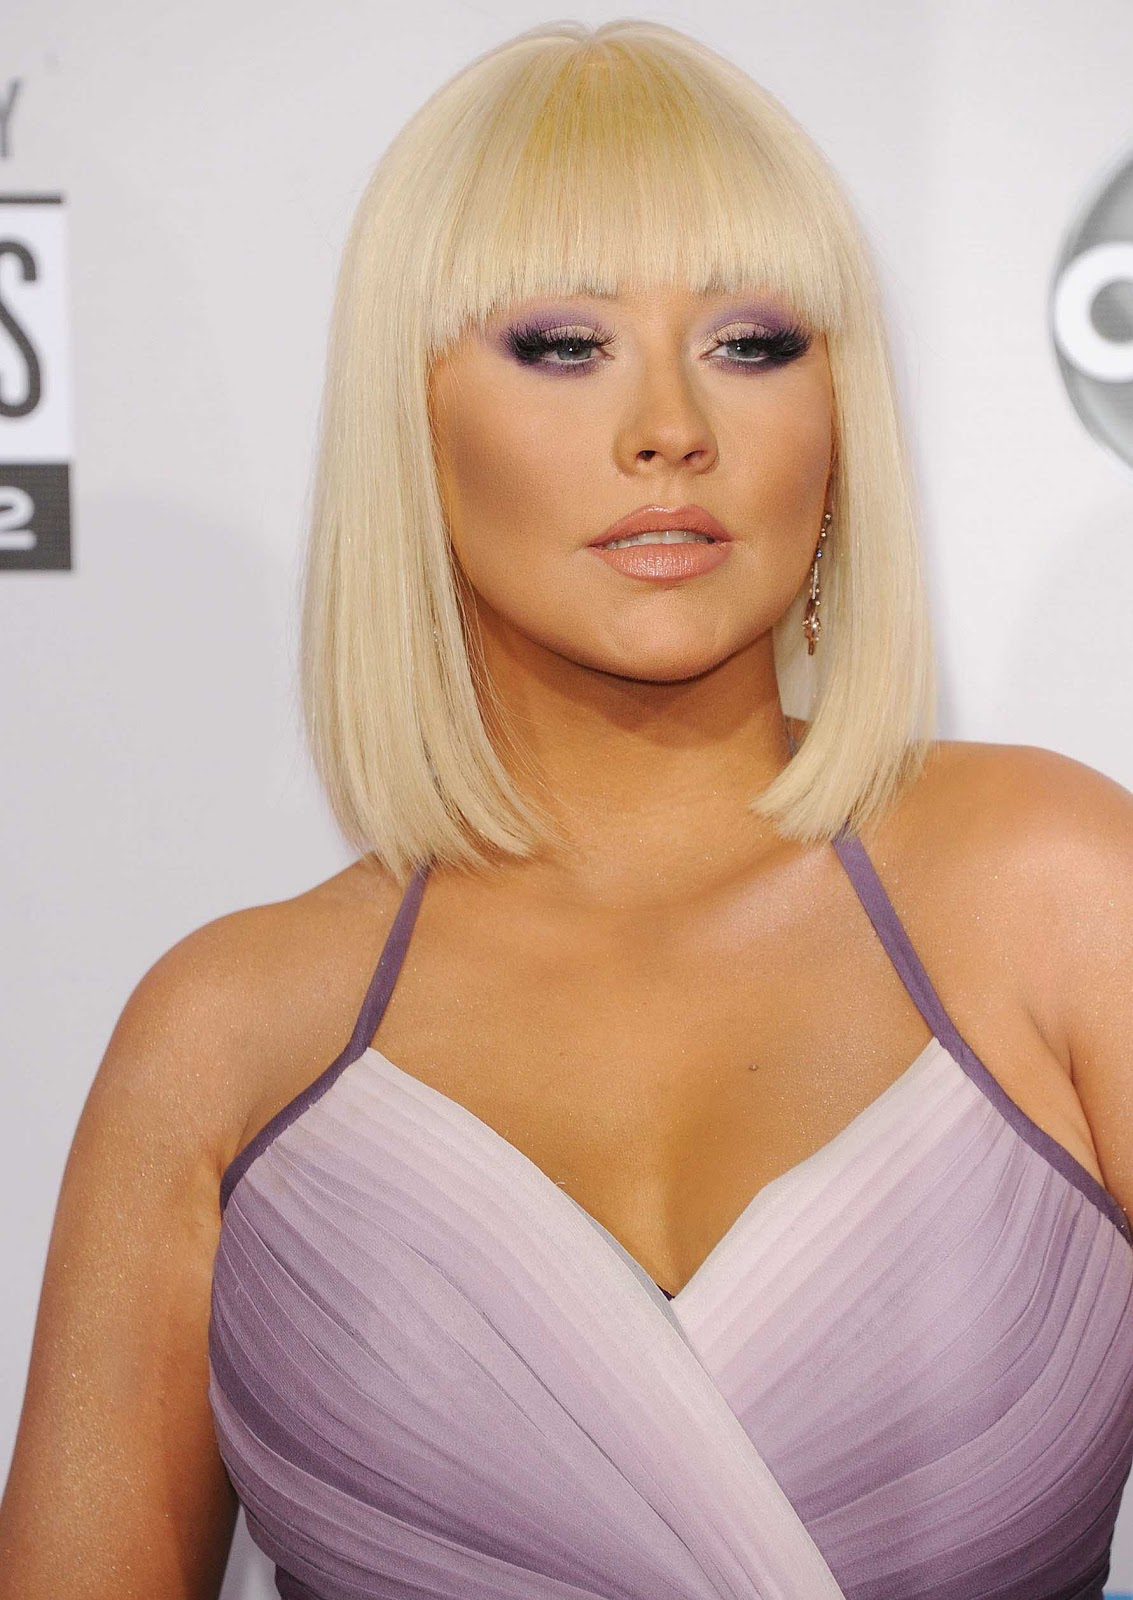 http://2.bp.blogspot.com/-ICsw-jUMxpY/UKrX4upC1CI/AAAAAAACo-s/eTlZGhTSCo4/s1600/Christina+Aguilera.jpg